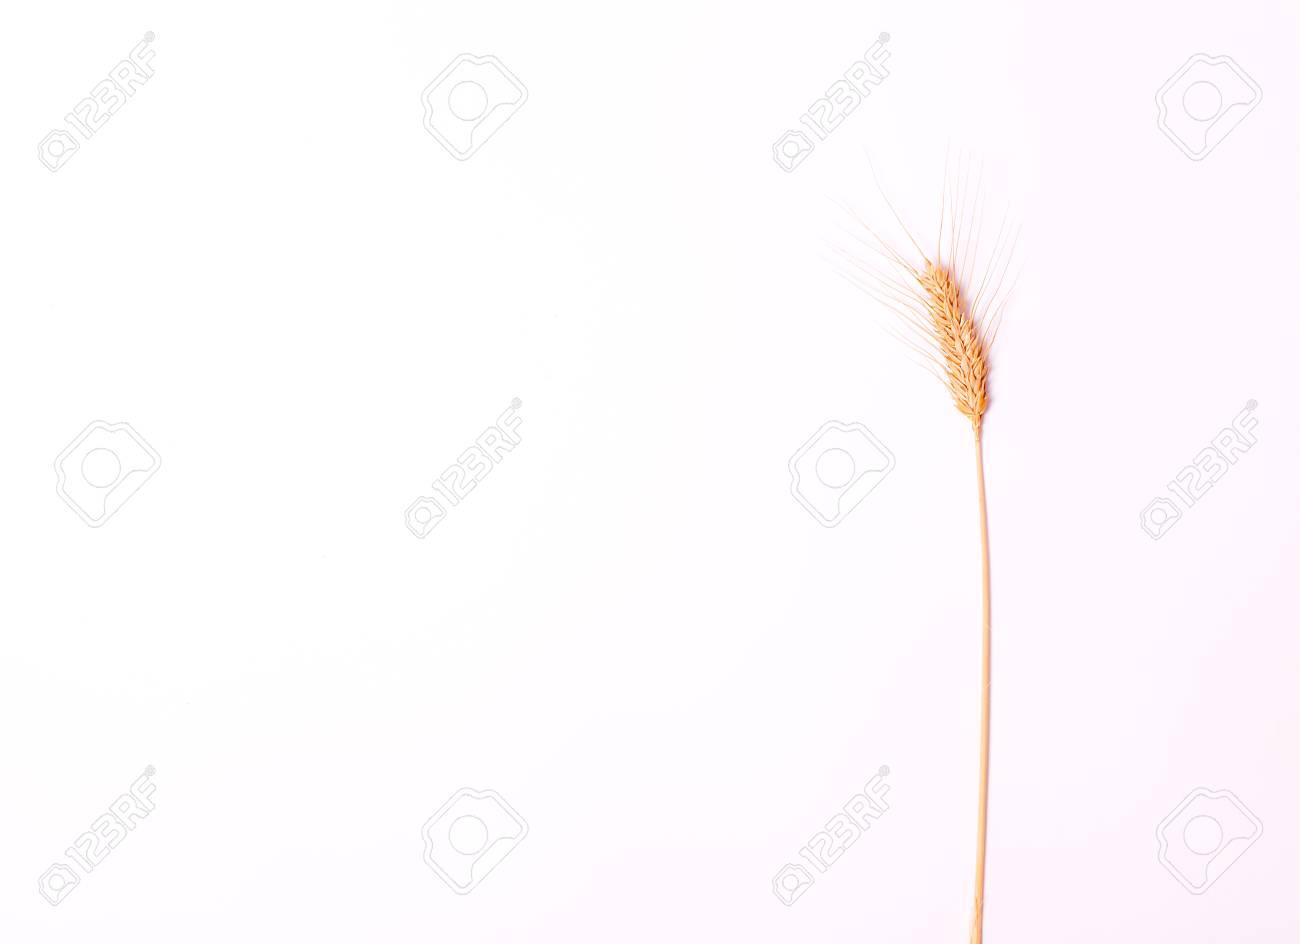 Ear on white background. Spike. Isolated background. - 85933260